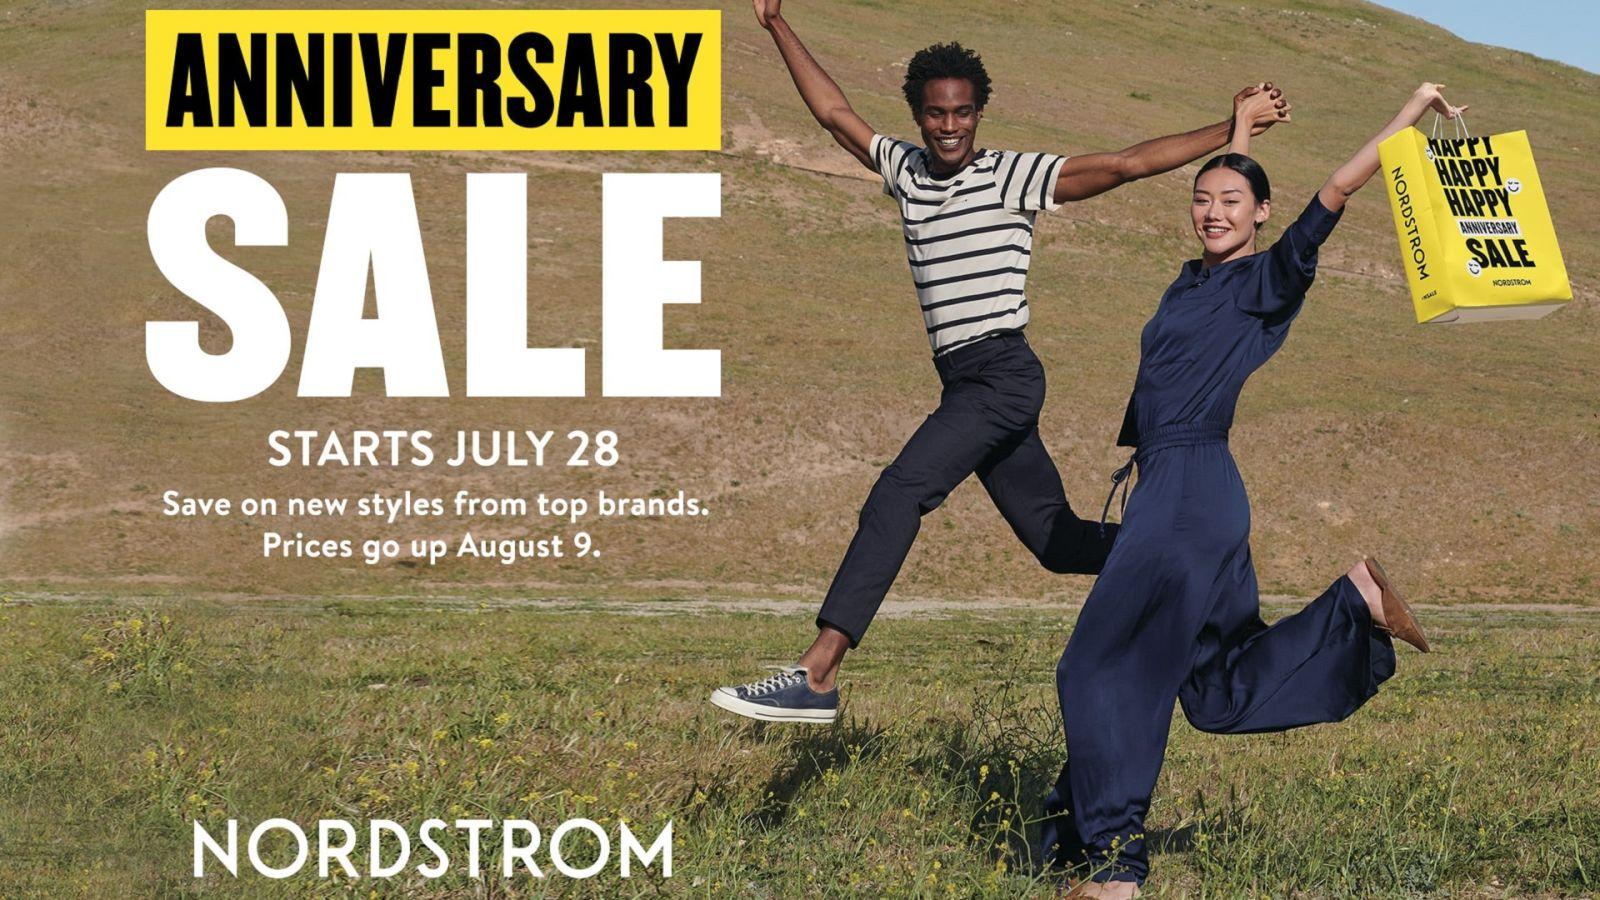 [CF Rideau Centre] - Nordstrom Anniversary Sale